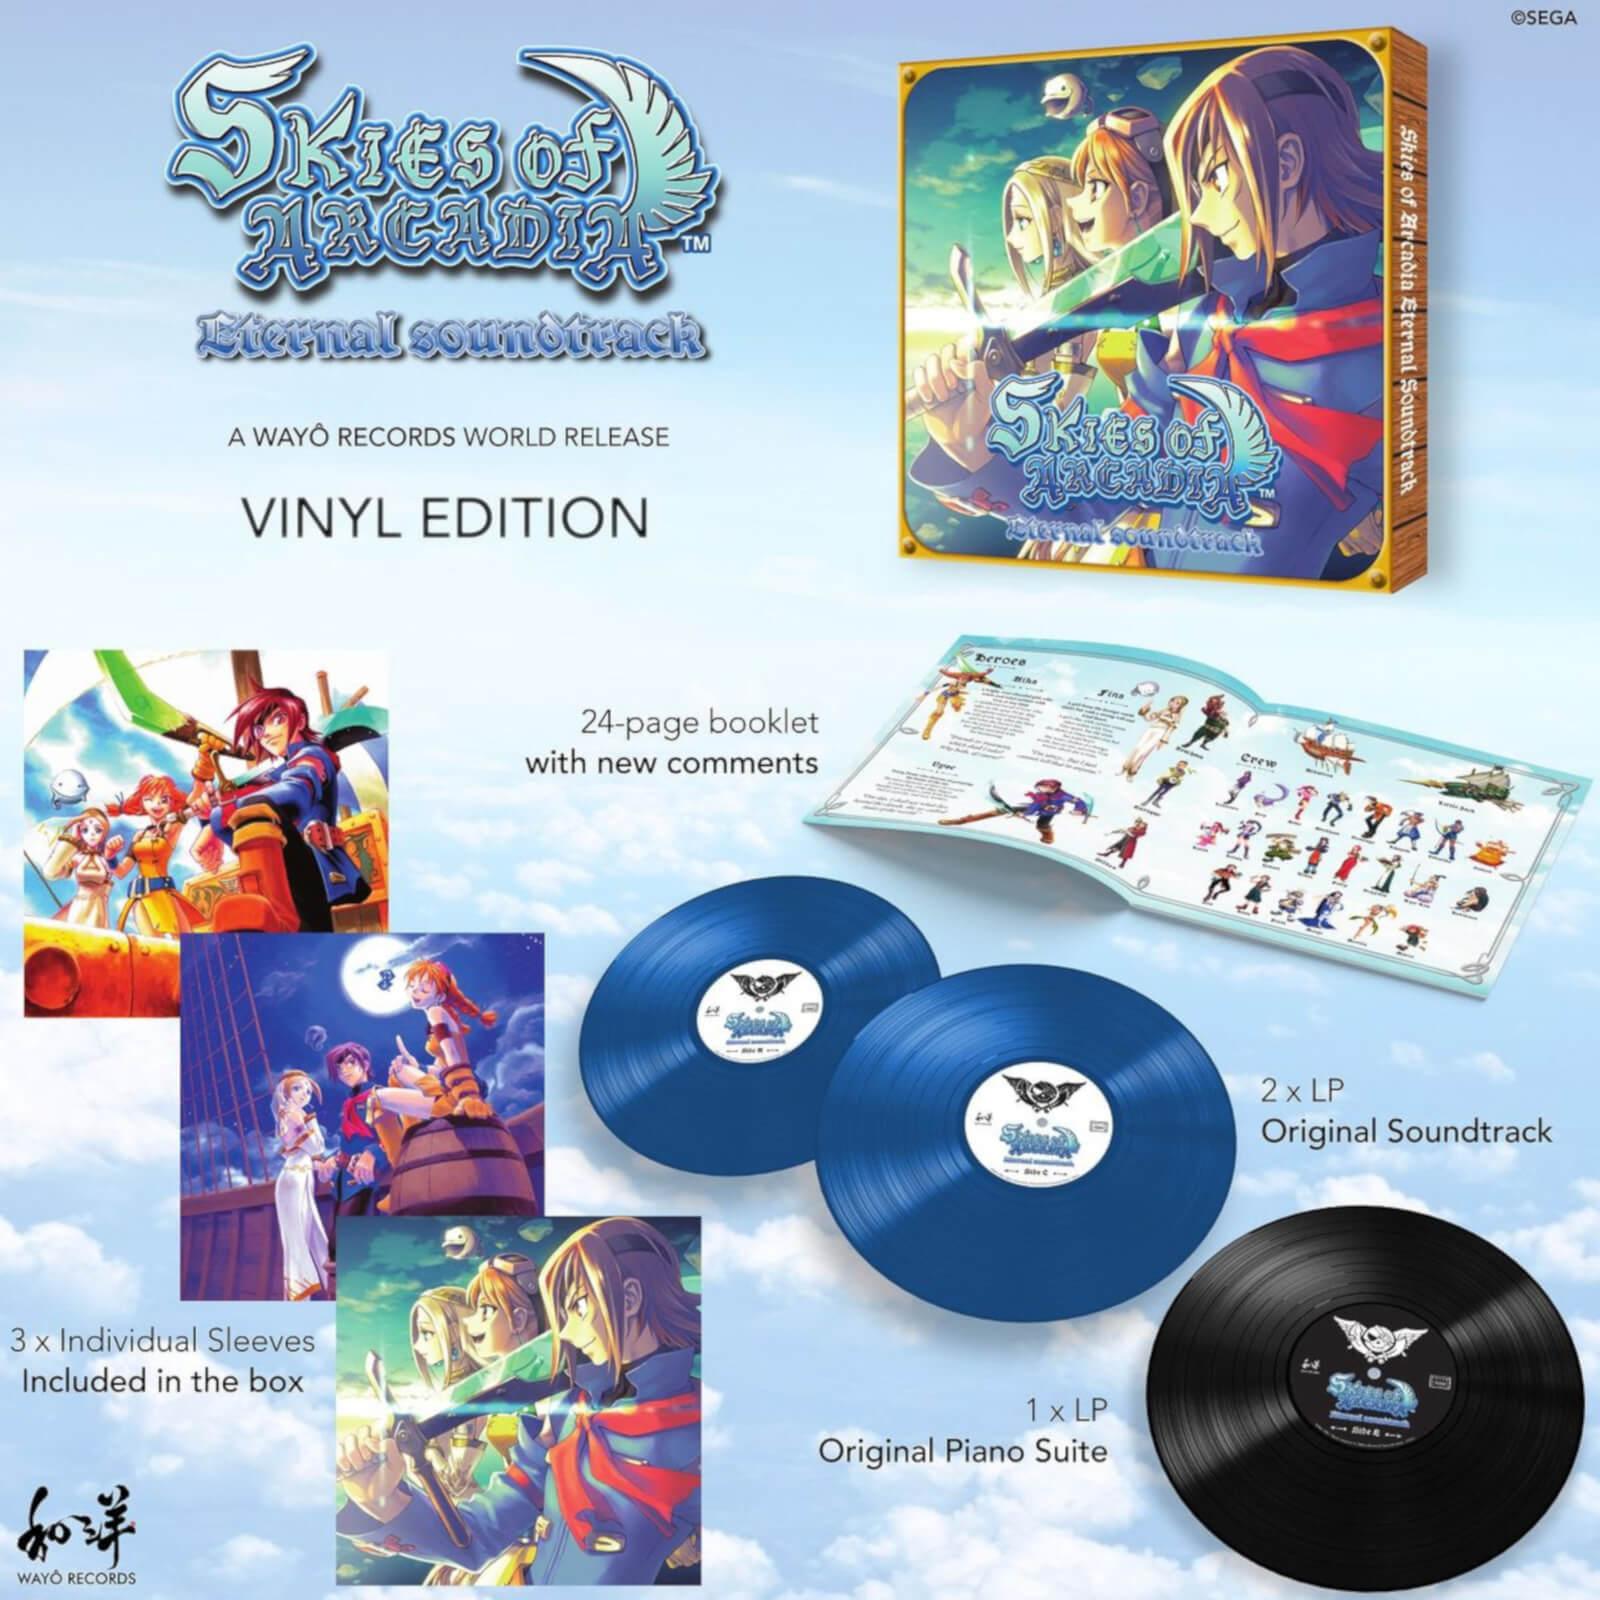 Skies of Arcadia - Eternal Soundtrack 3xLP